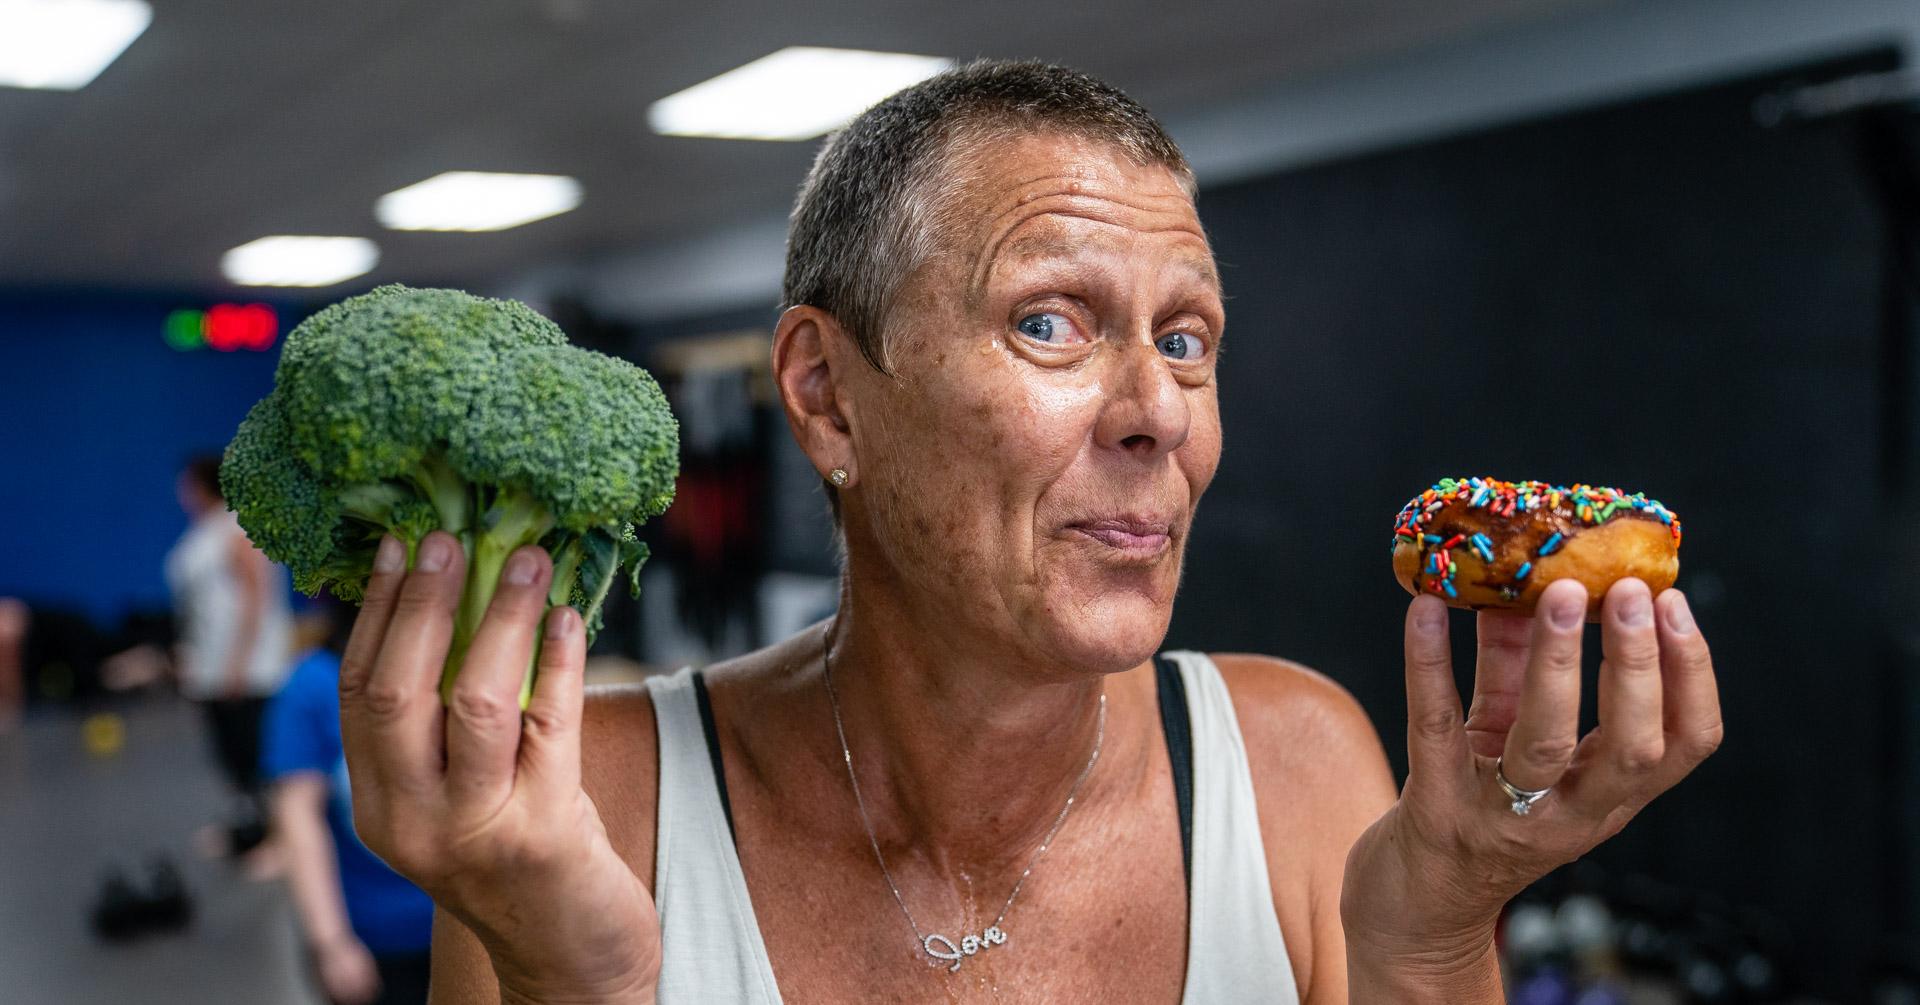 blog - cover photo - nutrition - 80-20 donut broccoli - facebook ad.jpg